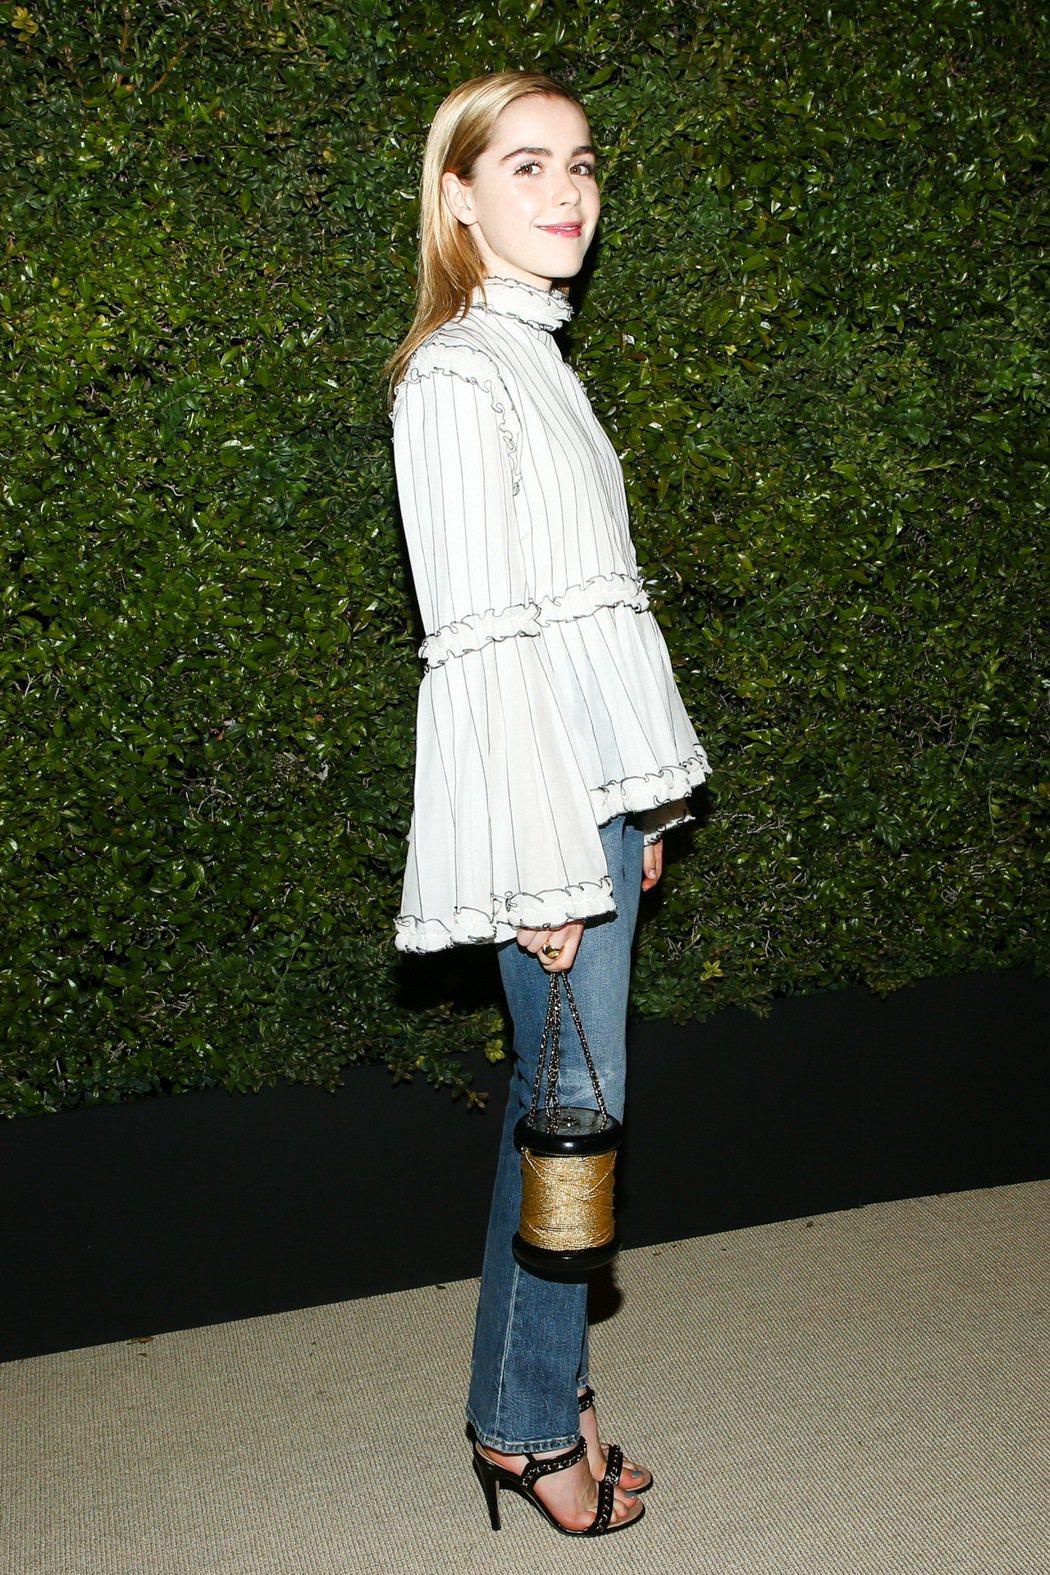 Kiernan Shipka穿著香奈兒2017春夏白色立體褶飾絲質上衣配香奈兒包